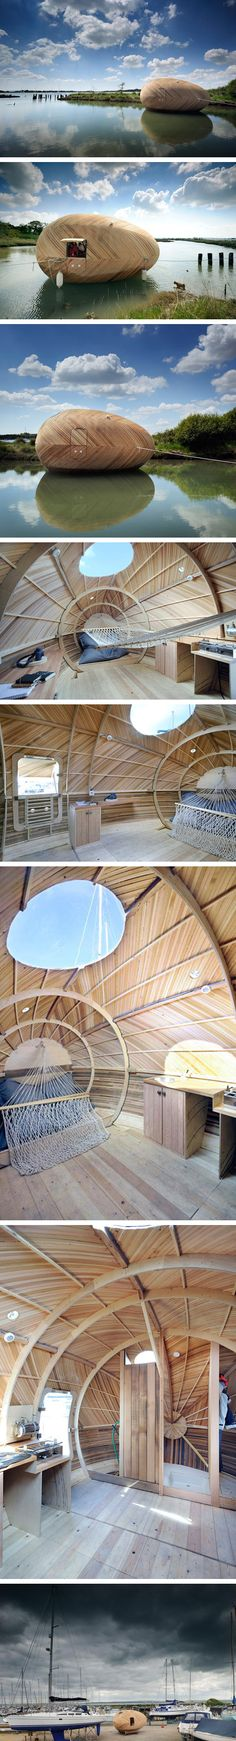 Exbury egg is artist Stephen Turner's temporary work space.